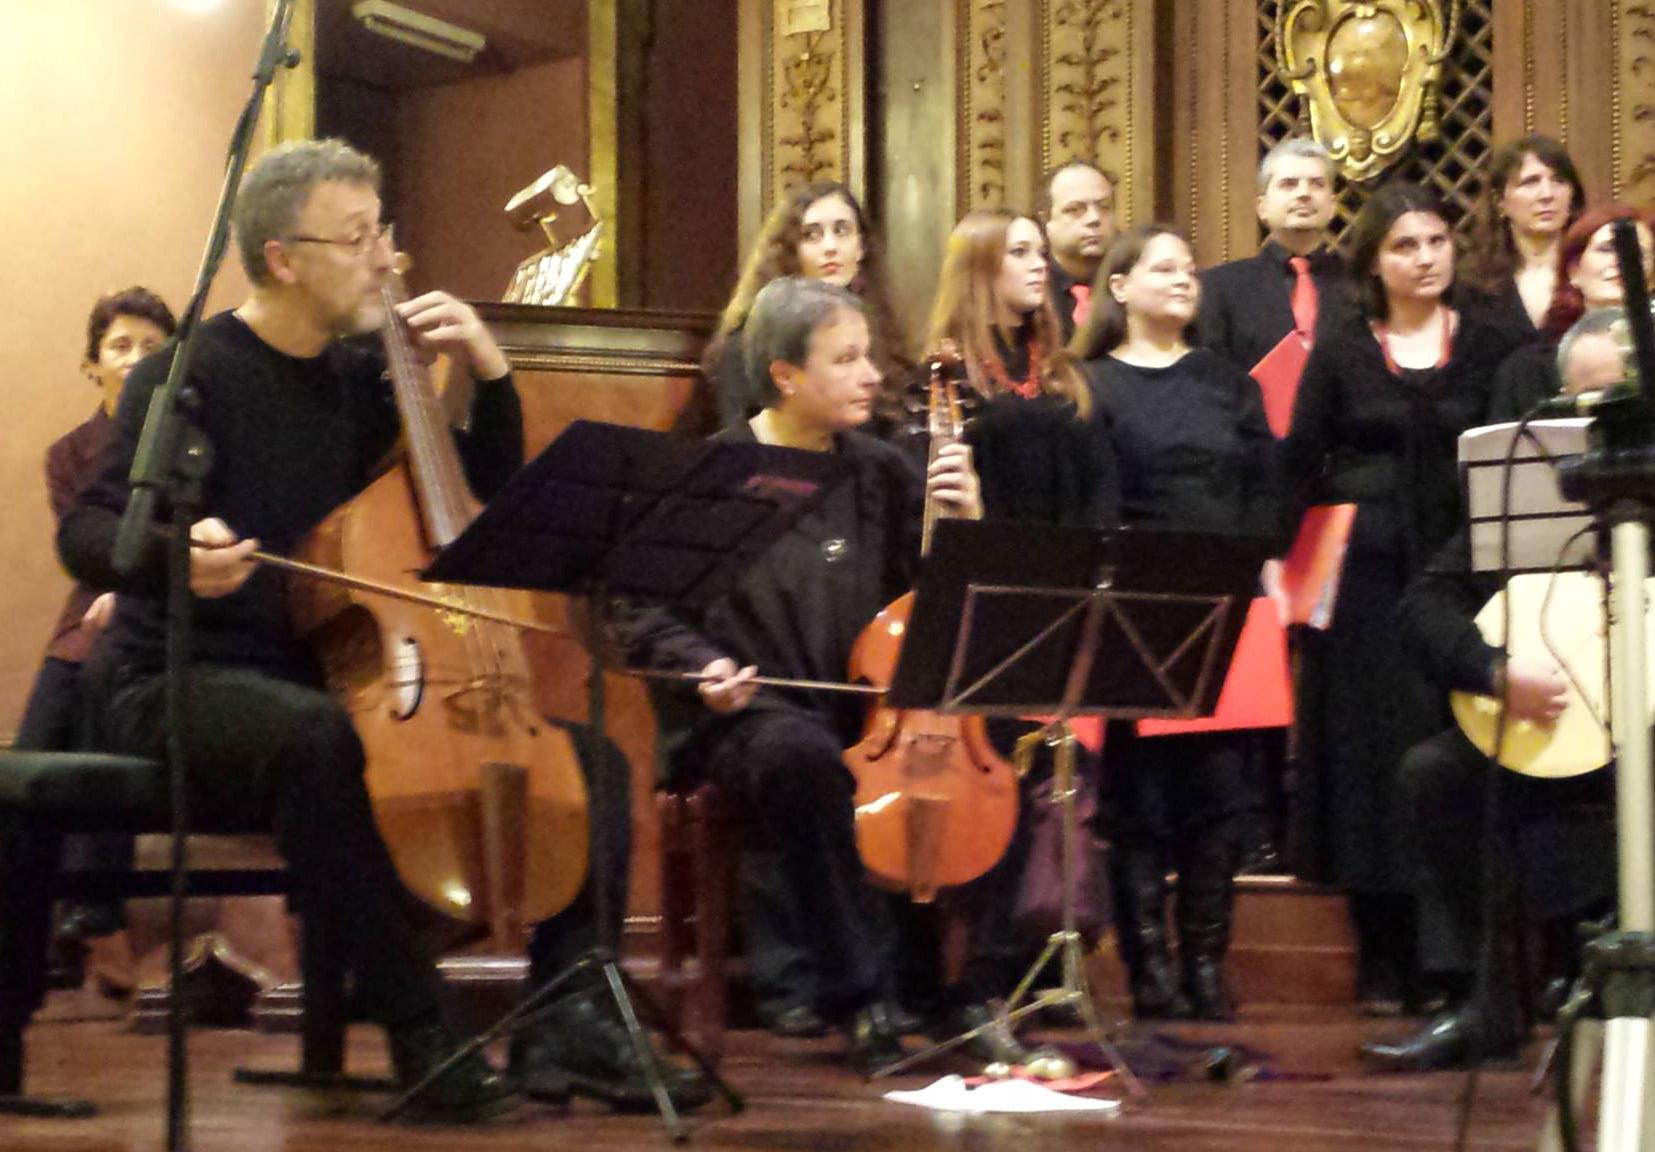 20140202_ConcertoMeridies_08